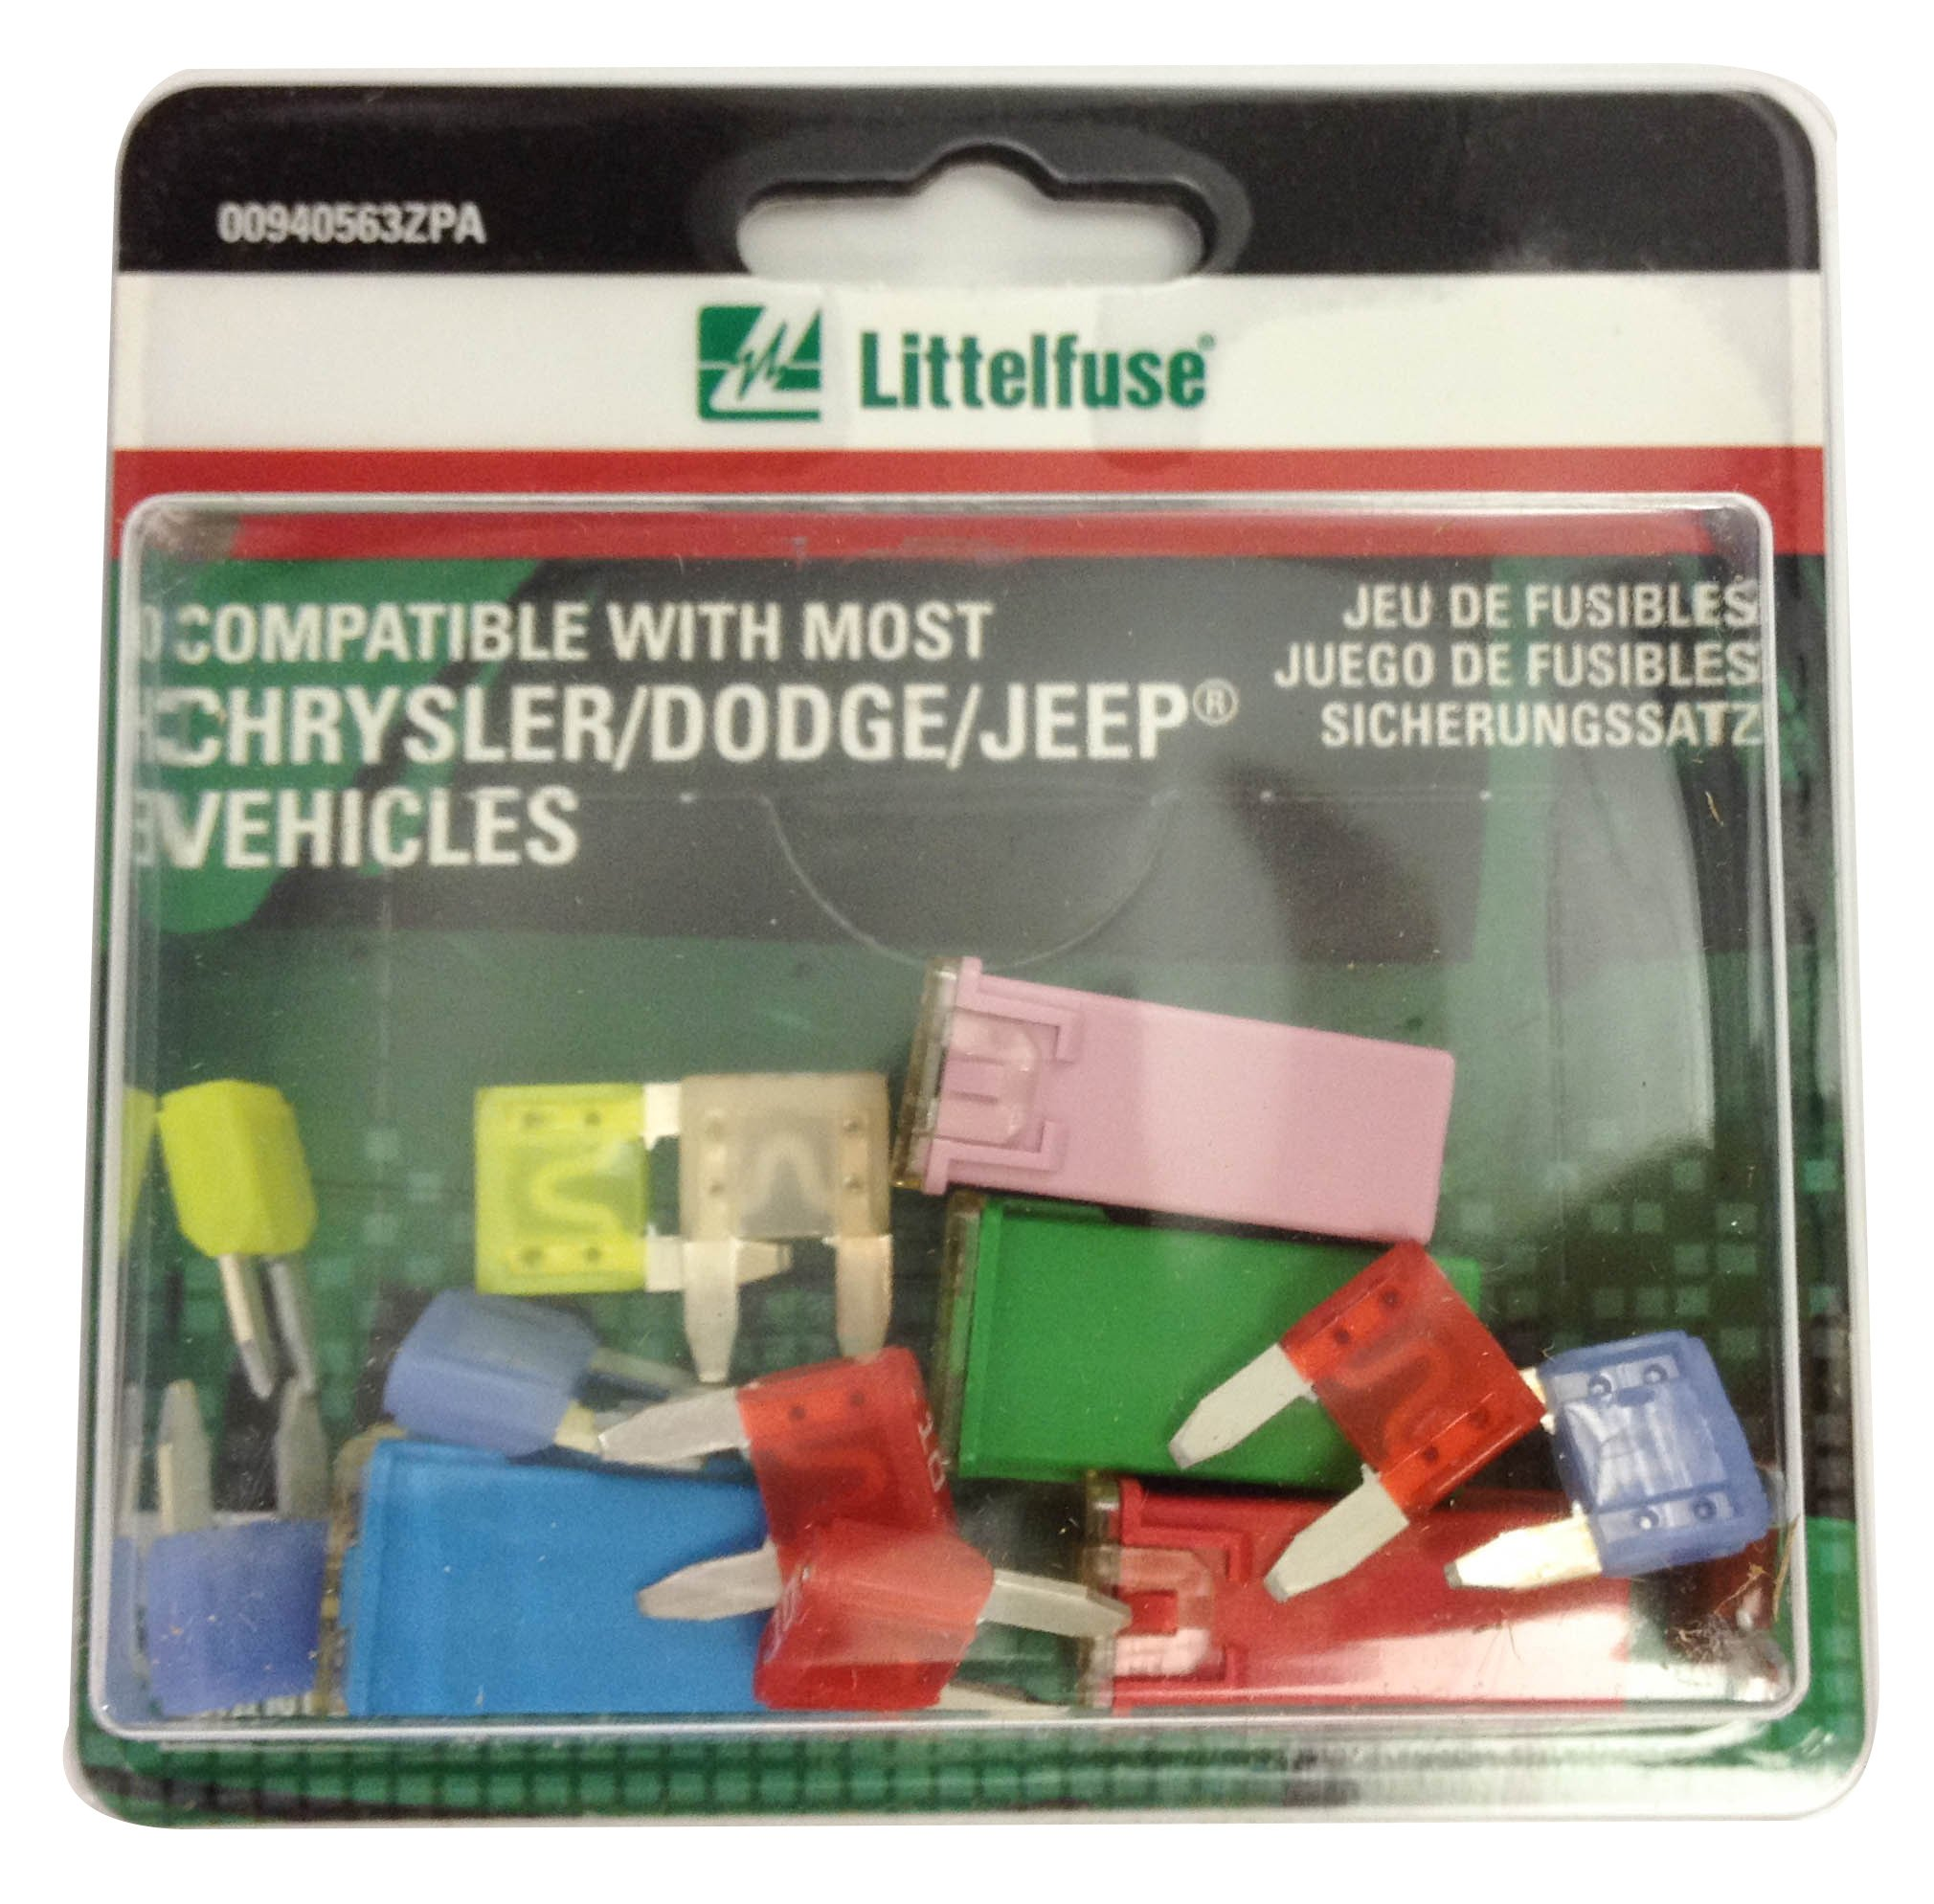 Littelfuse 00940563ZPA 5pcs OEM Emergency Fuse Kit for Chrysler/Dodge/Jeep by Littelfuse (Image #1)